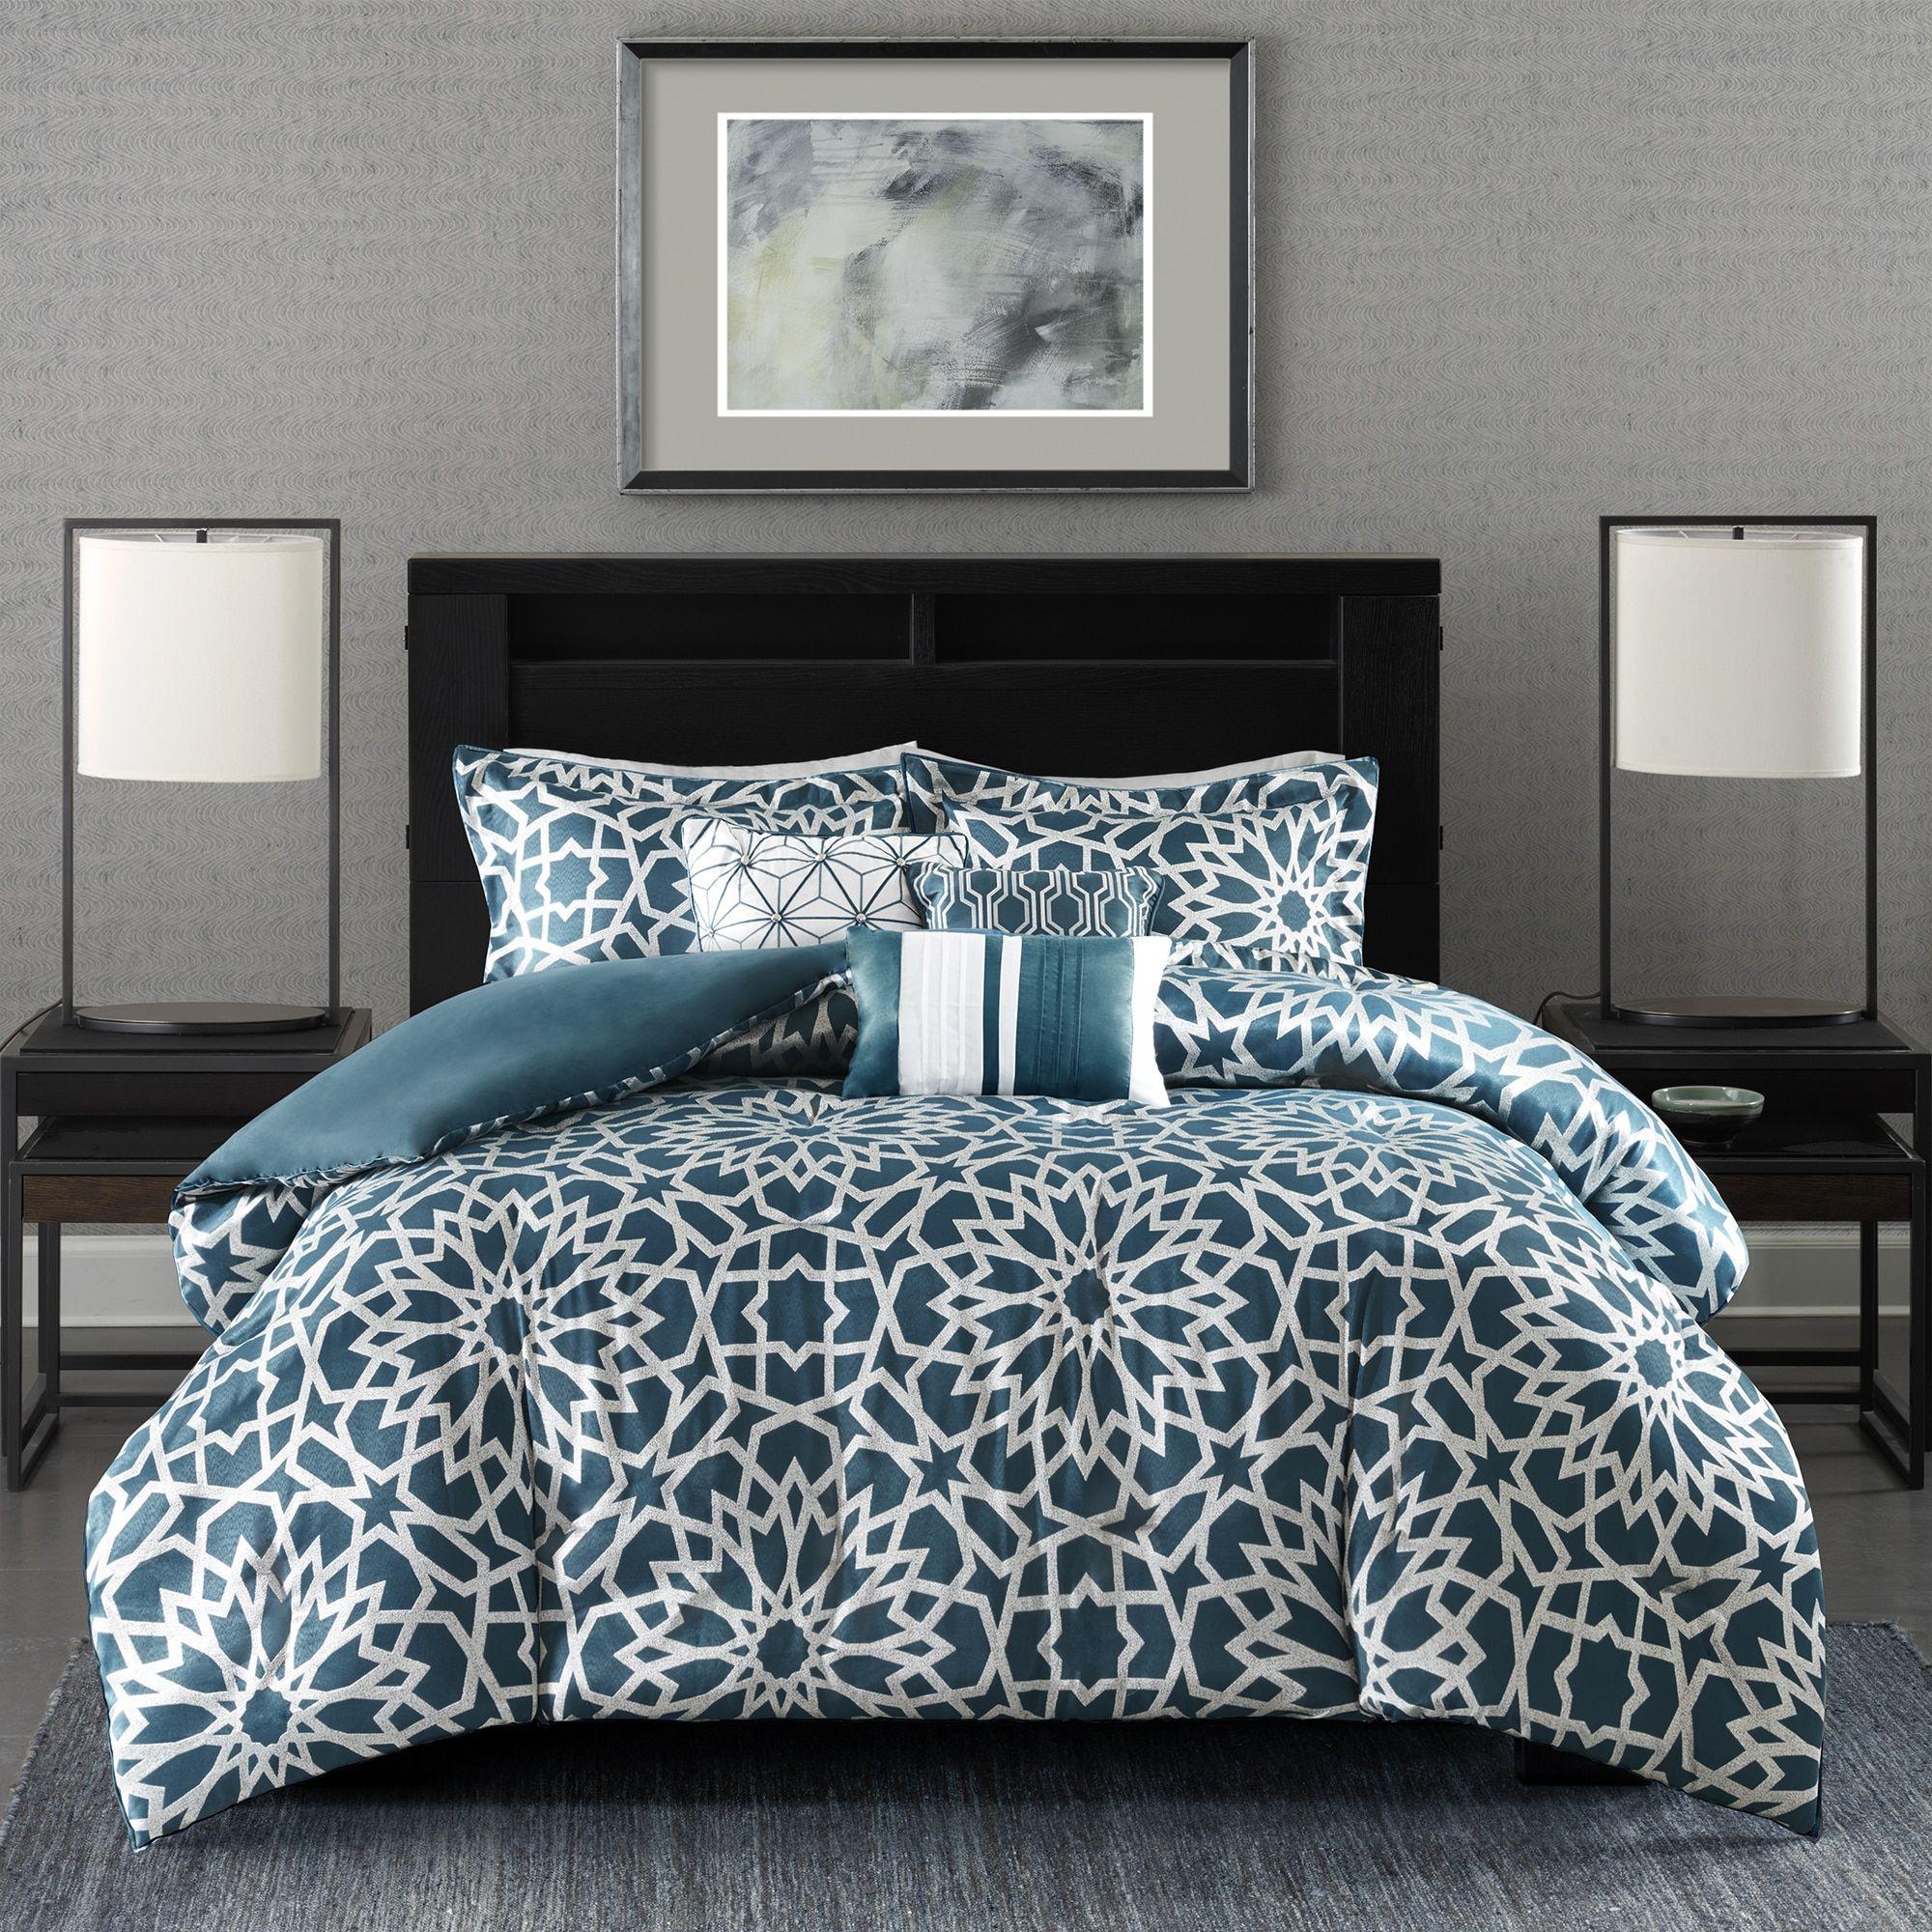 dp yellow kitchen printed cover duvet black amazon reversible single uk geometric bedding l co pillowcase set jazz home bed